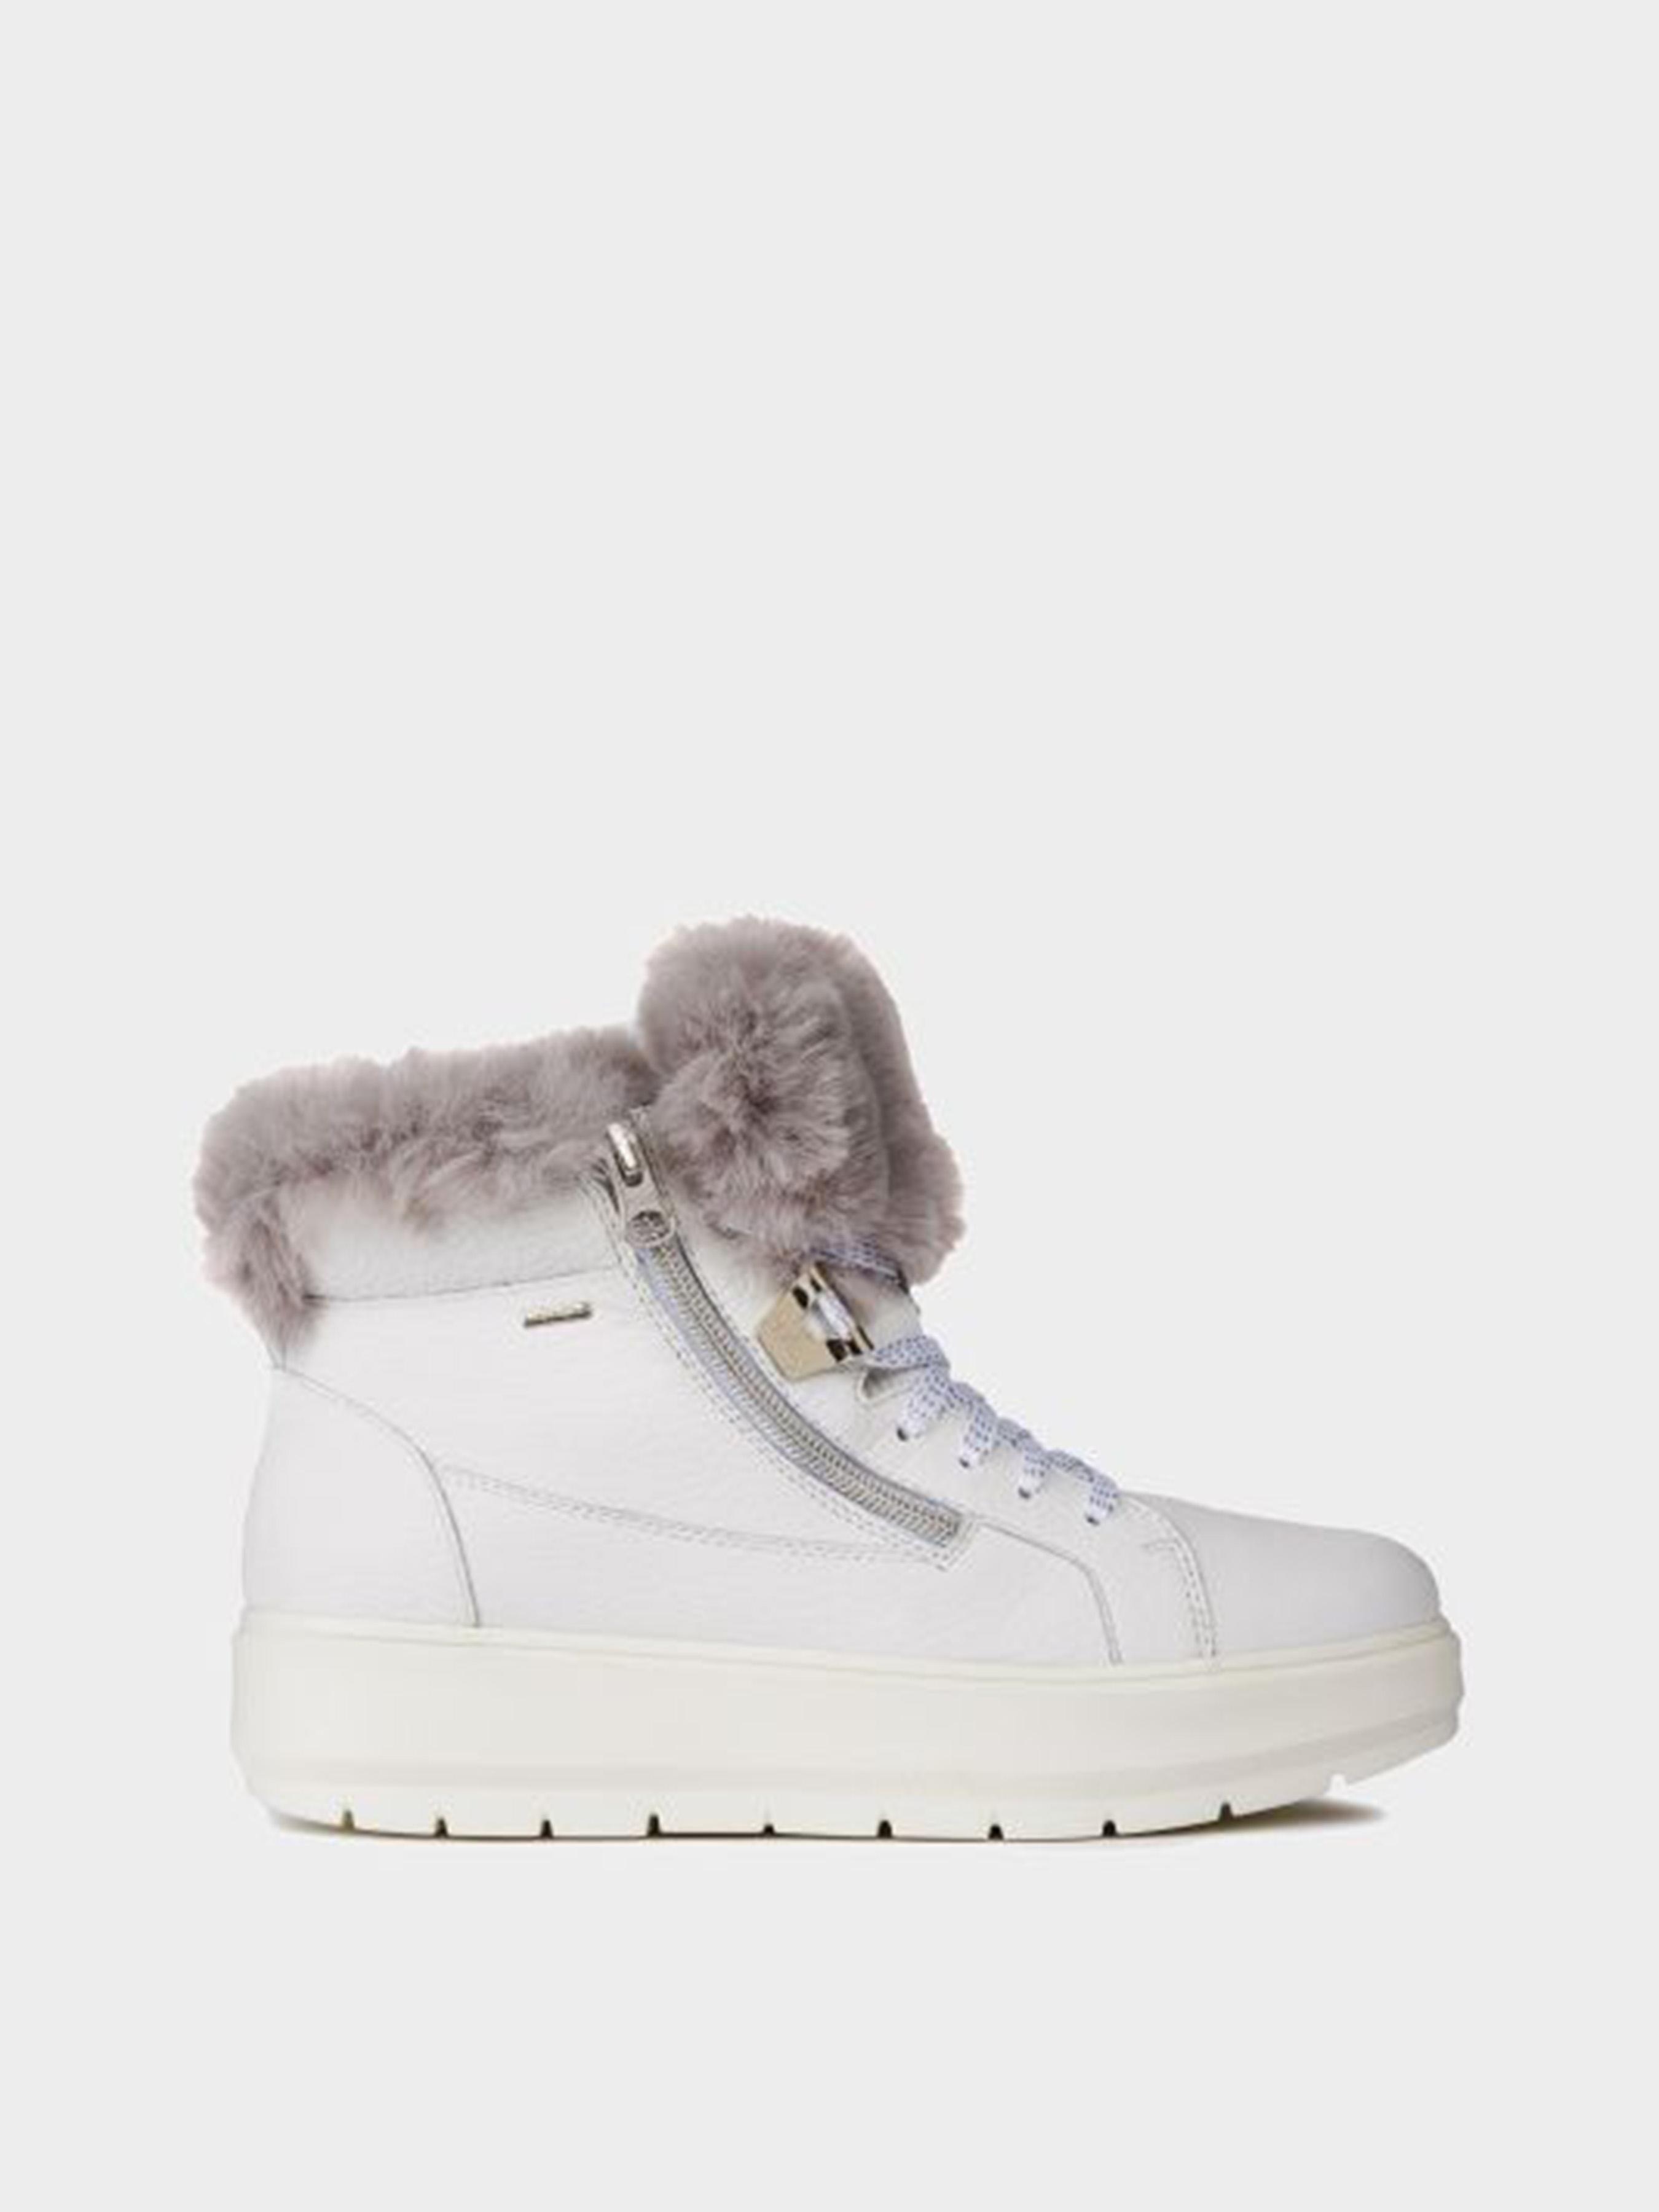 Купить Ботинки женские Geox D KAULA B ABX XW3619, Белый